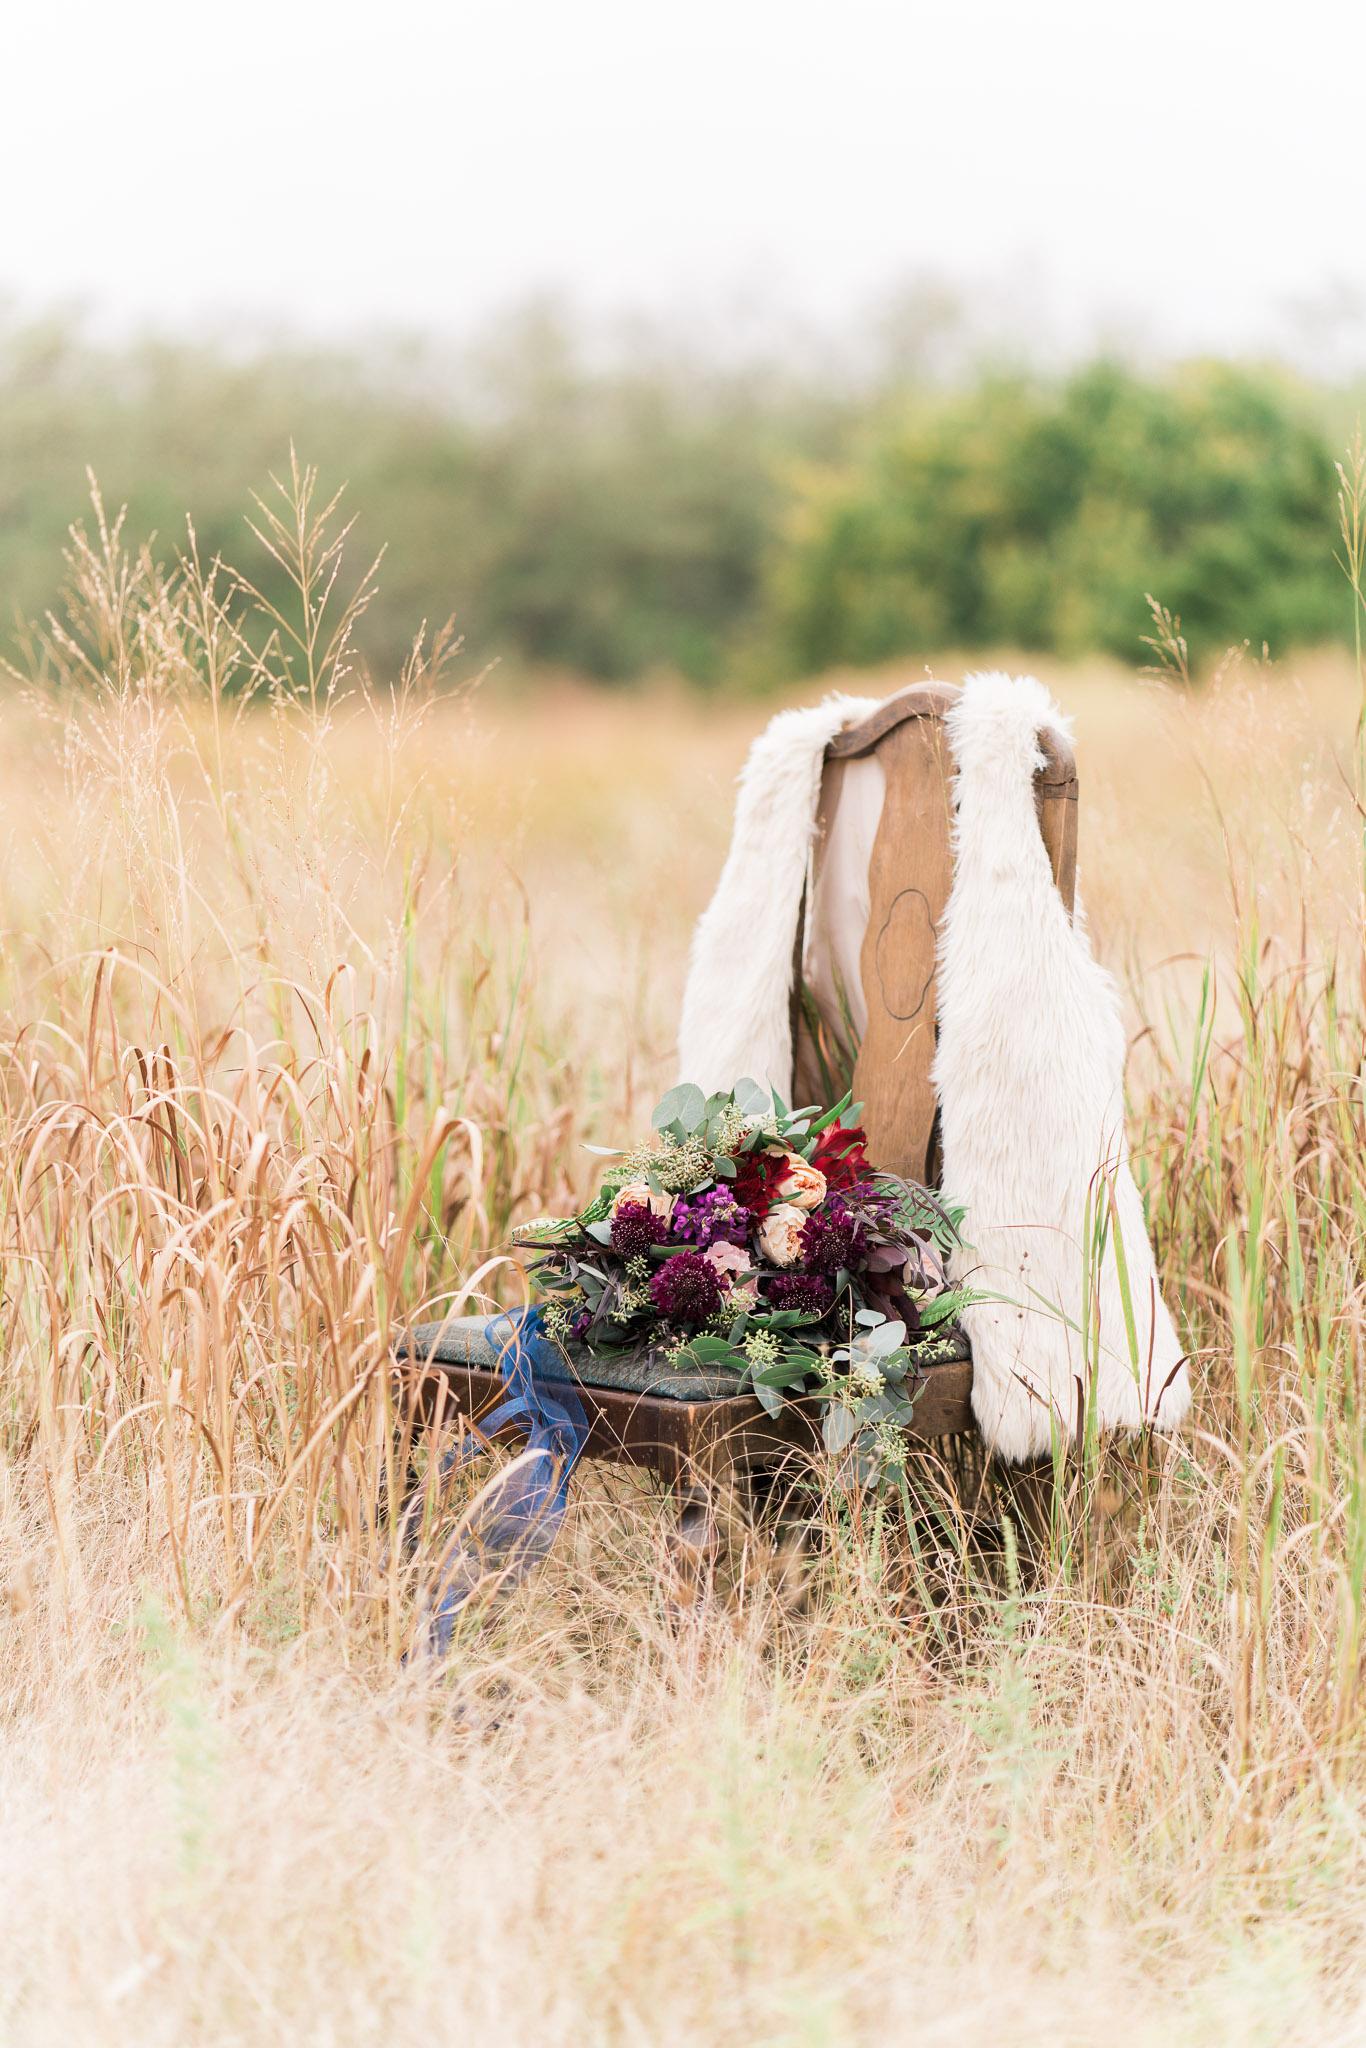 Lizanne-Andrew-Maternity-Kate-Bernard-Photography-Web-2.jpg